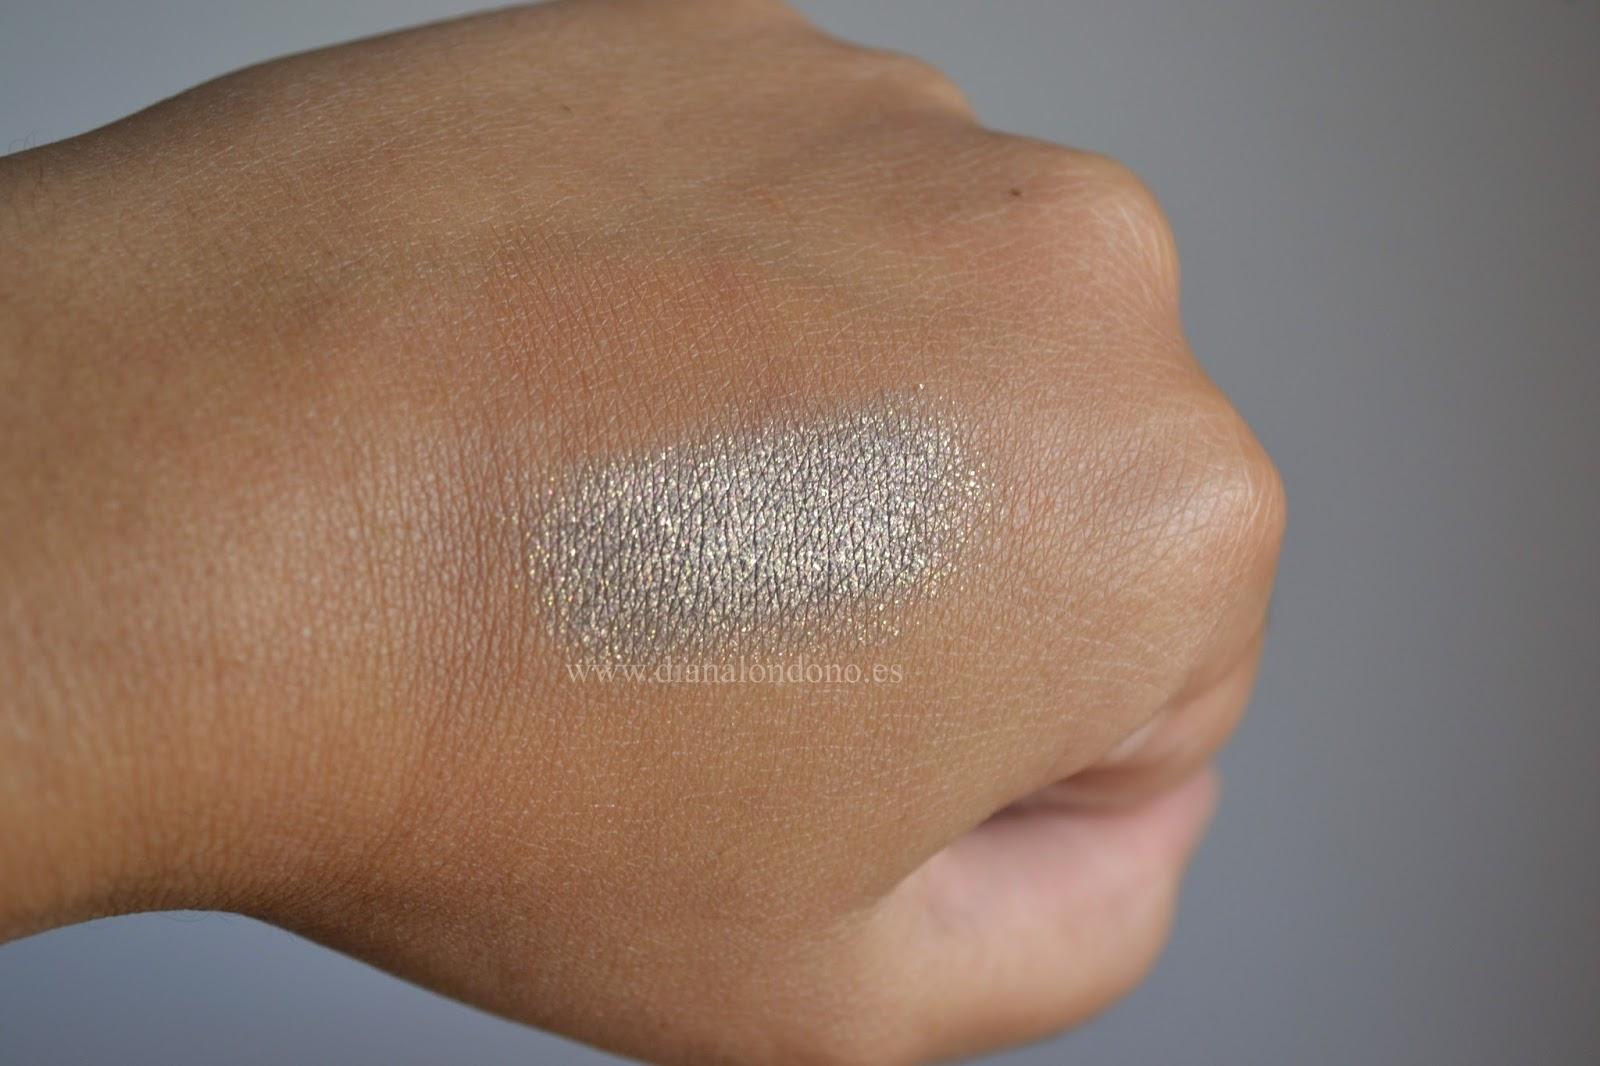 Swatch 2 luz indirecta sombra en crema tono husky Nabla cosmetcis